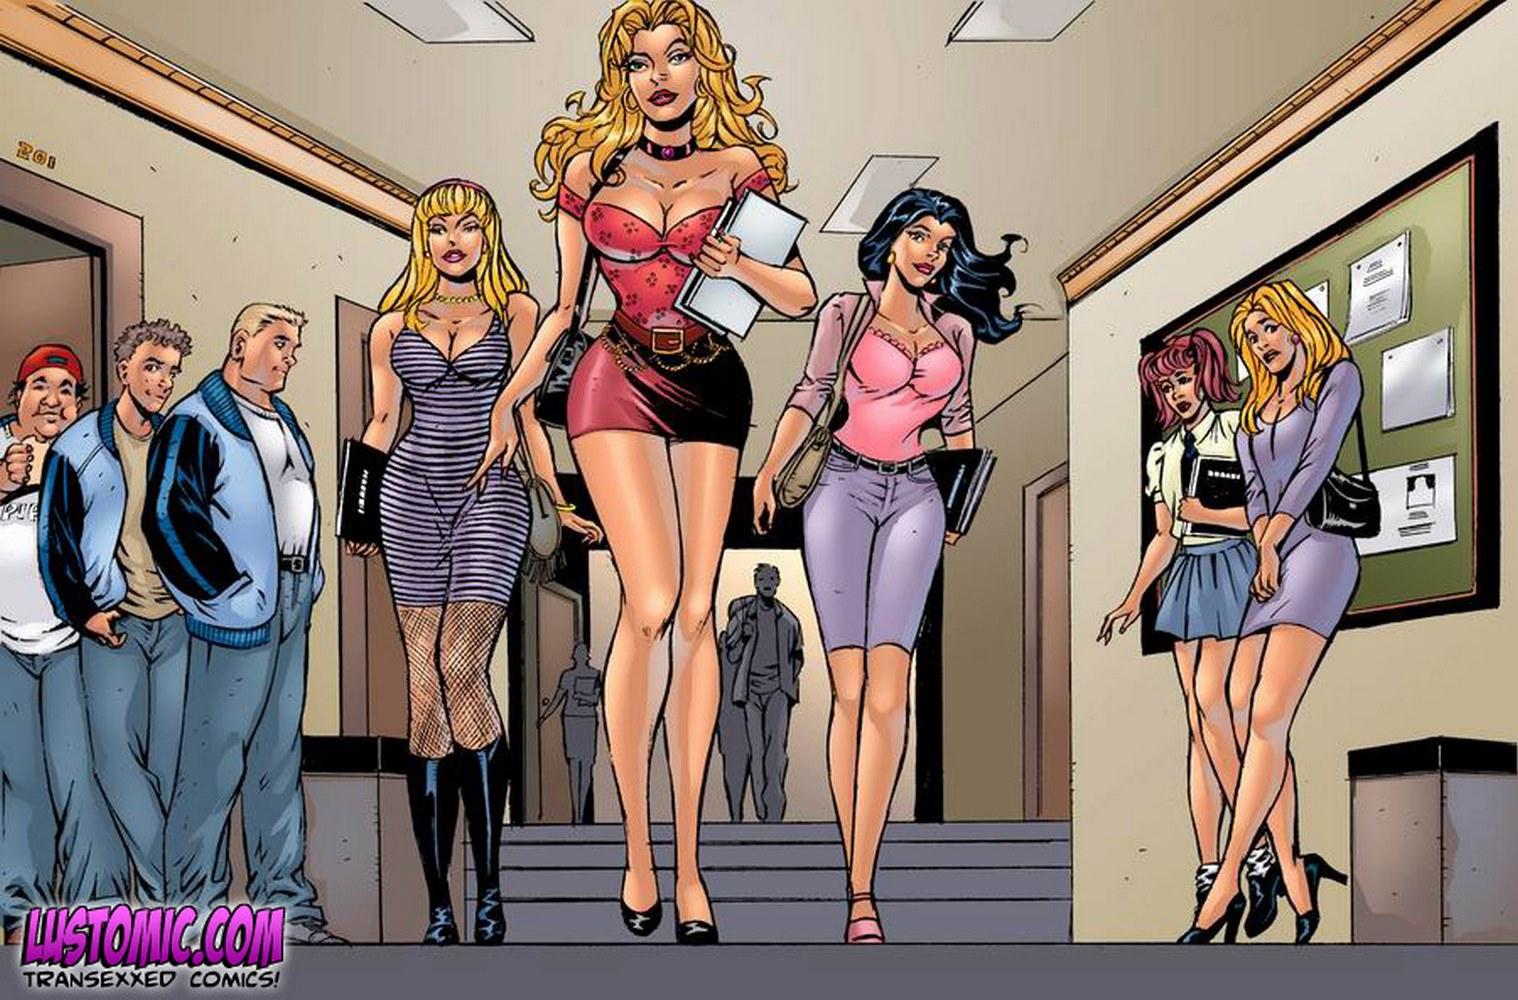 Porn Comics - Sorority Sisters porn comics 8 muses